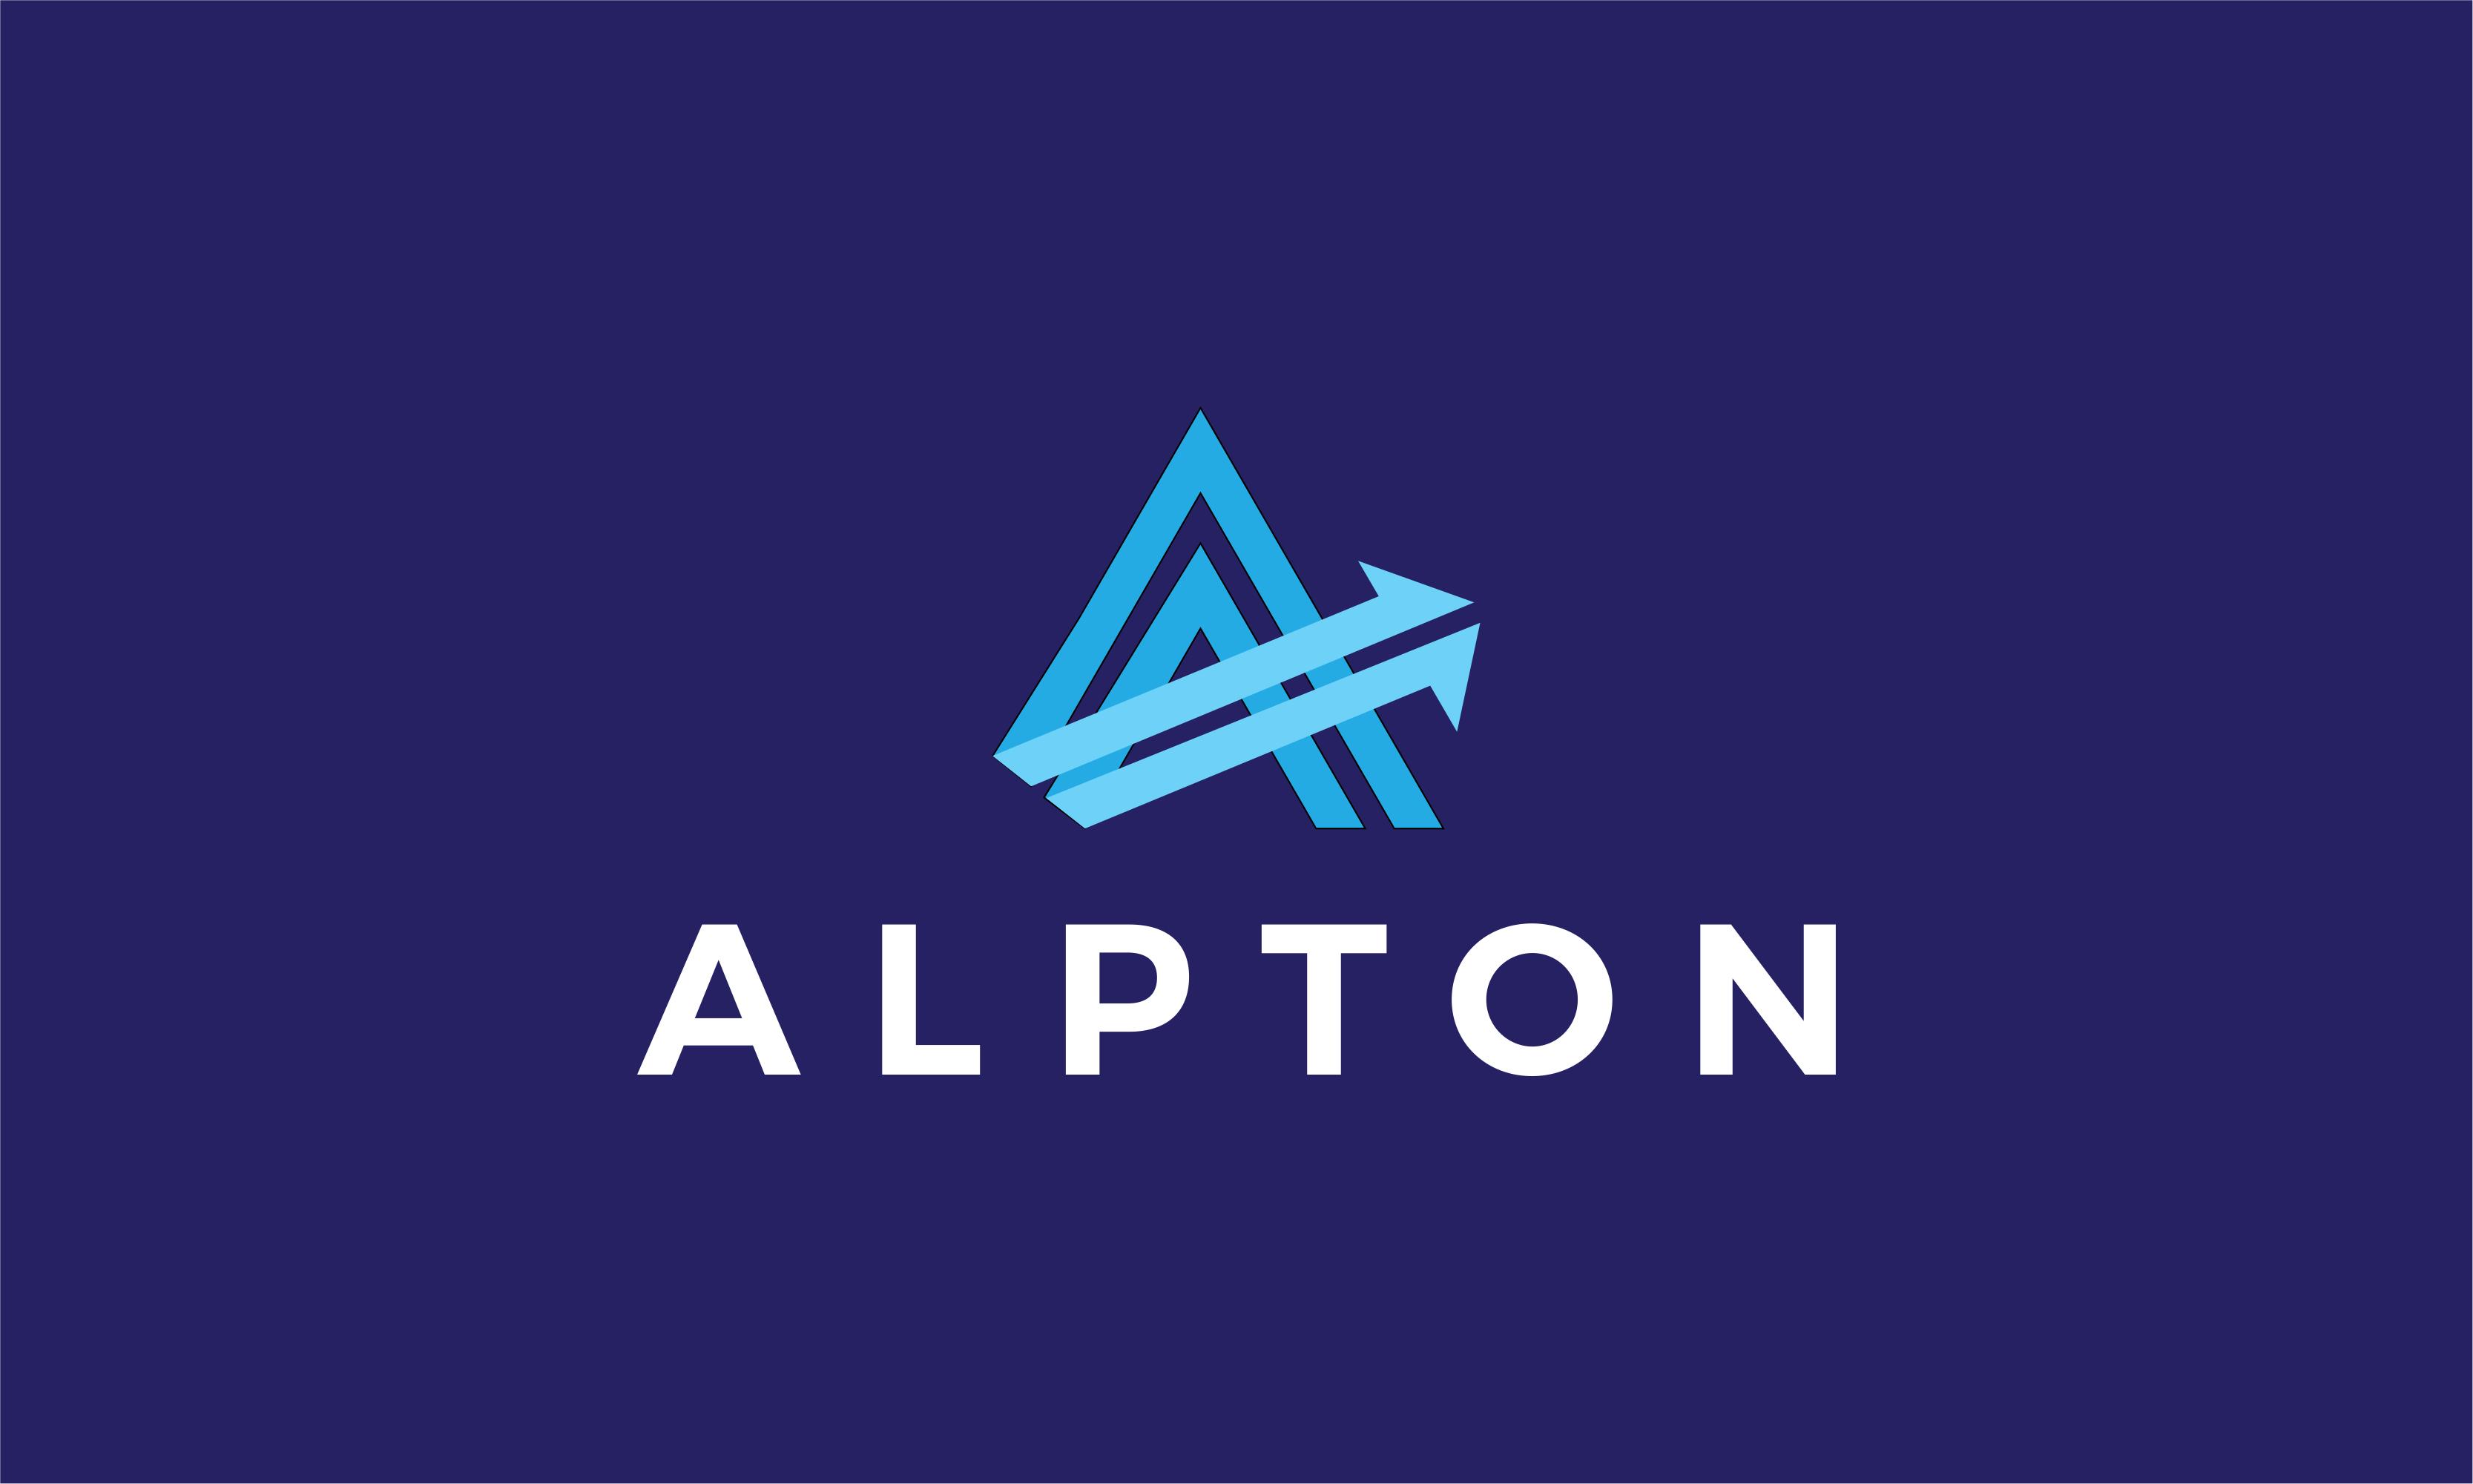 Alpton